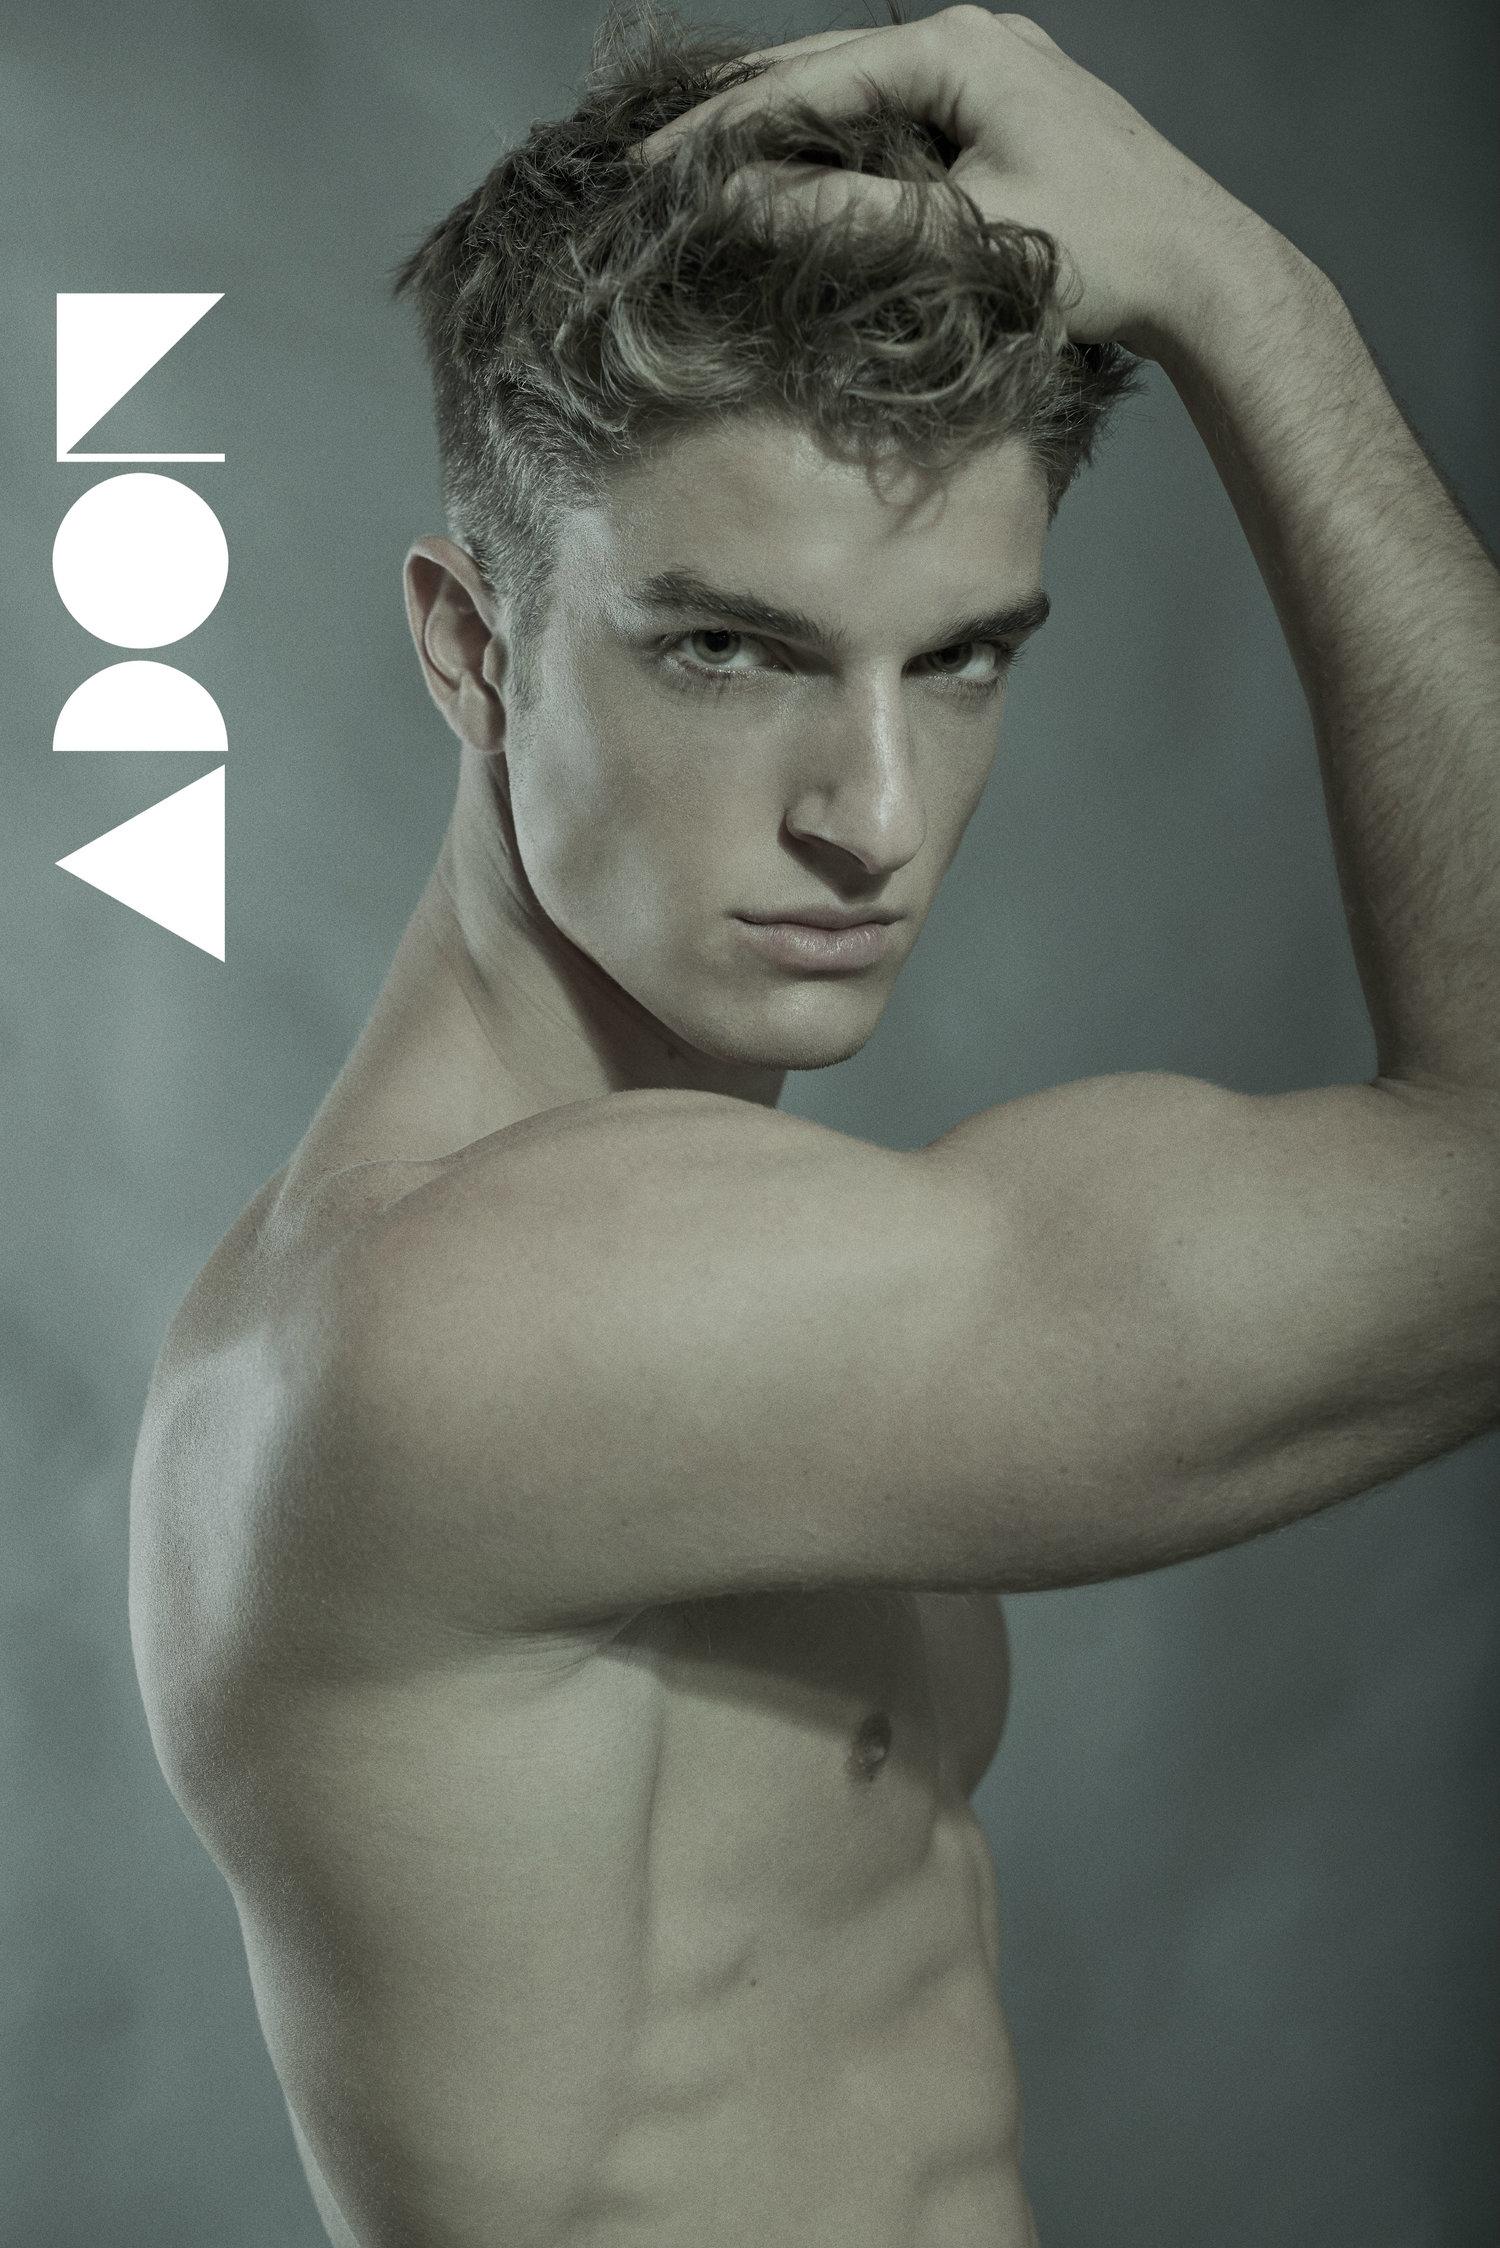 Adon Exclusive: Model Bruno Scafidi By Riccardo Torri